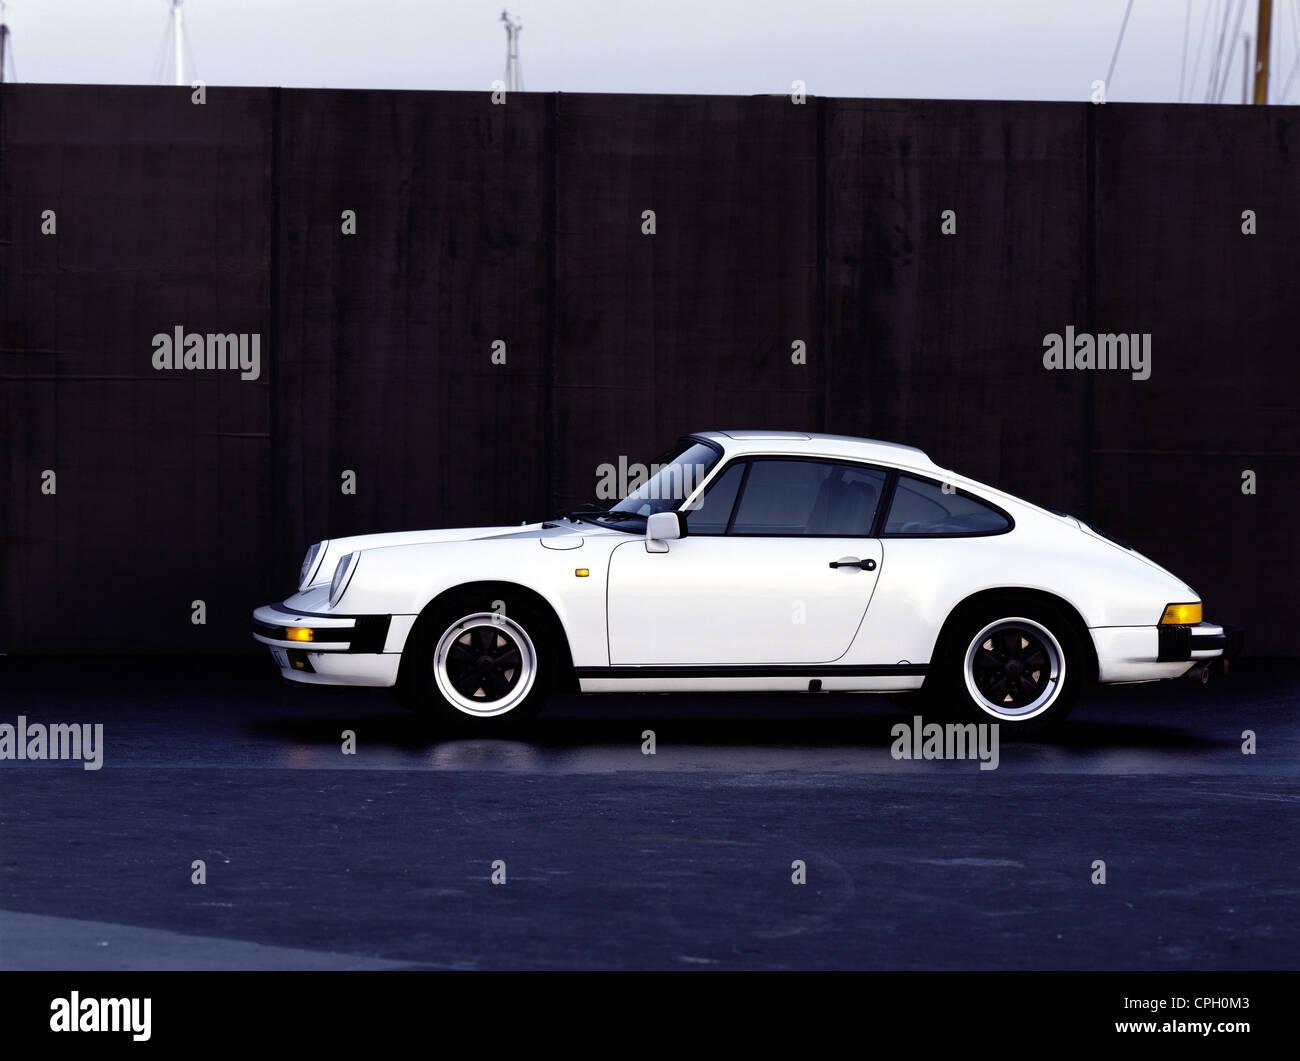 Transport Transportation Car Vehicle Variants Porsche 911 Stock Photo Alamy